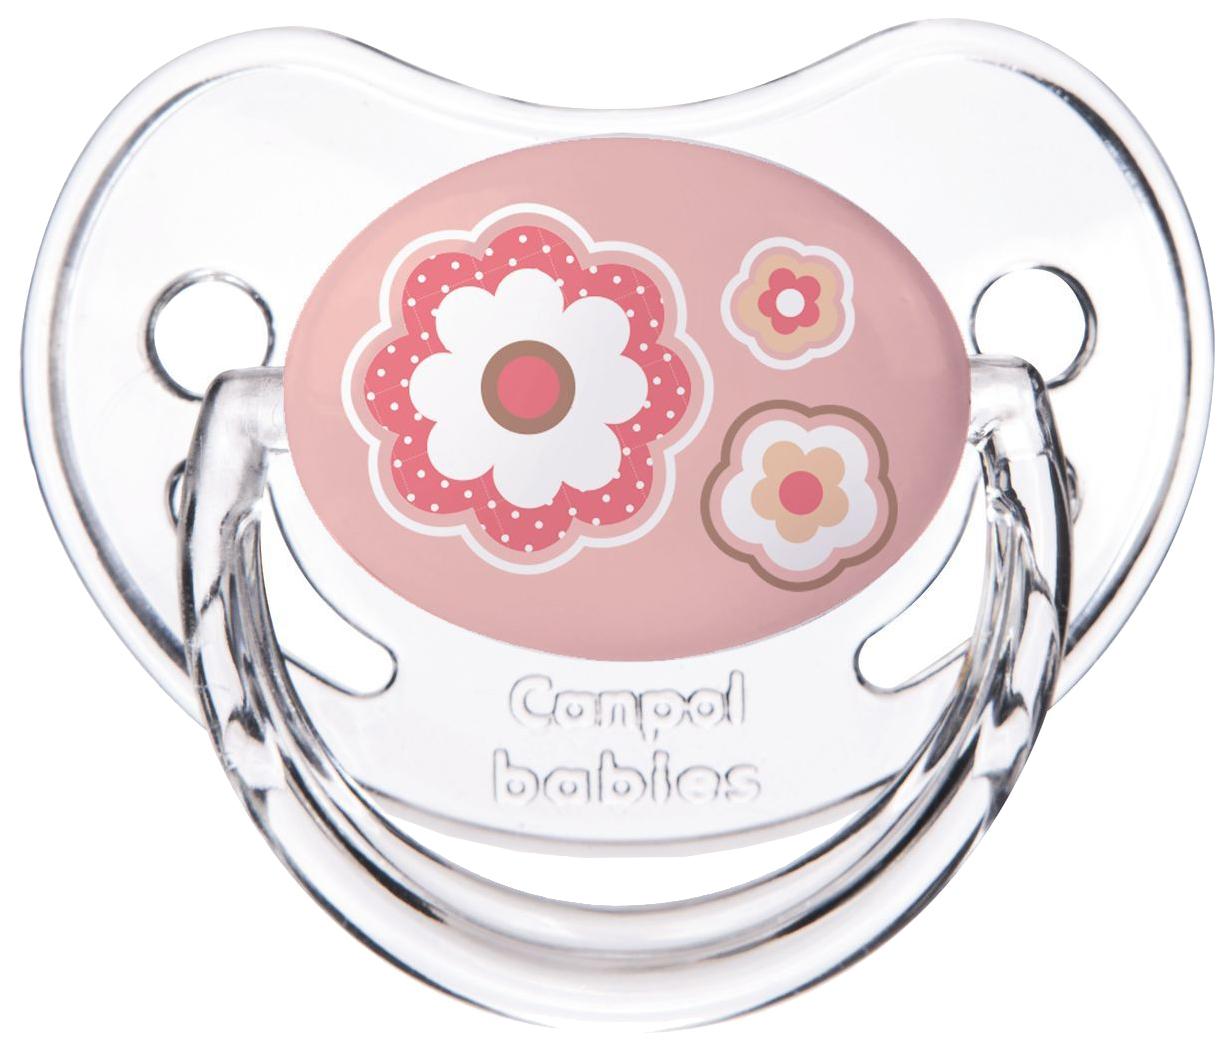 Пустышка Canpol Newborn baby симметричная, силикон, 6-18 мес., арт. 22/581 цвет розовый